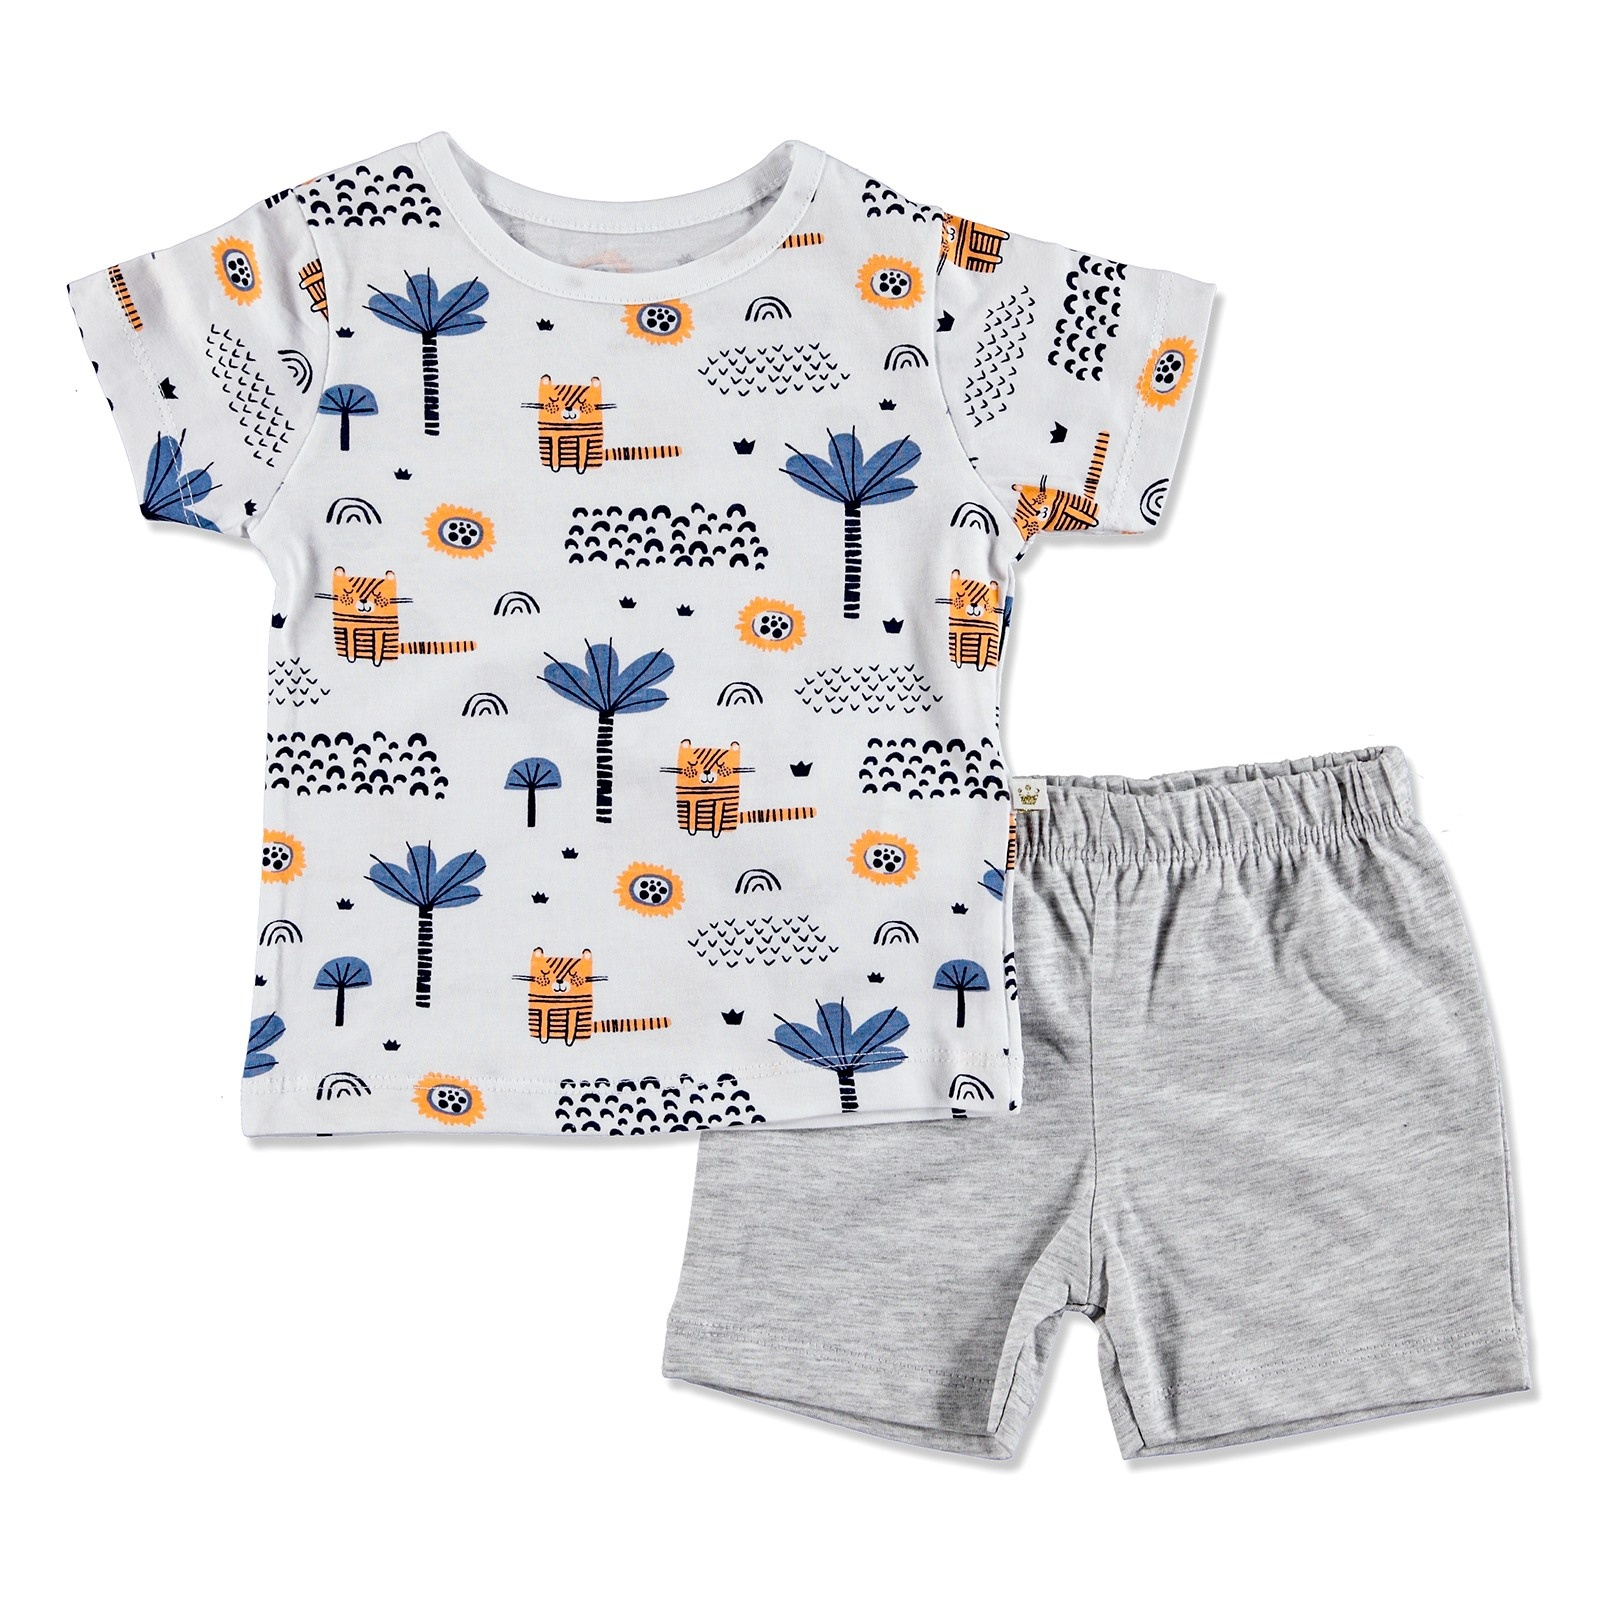 Ebebek For My Baby Summer Boy Alf Supreme Short Sleeve T-shirt 2 Pcs Set